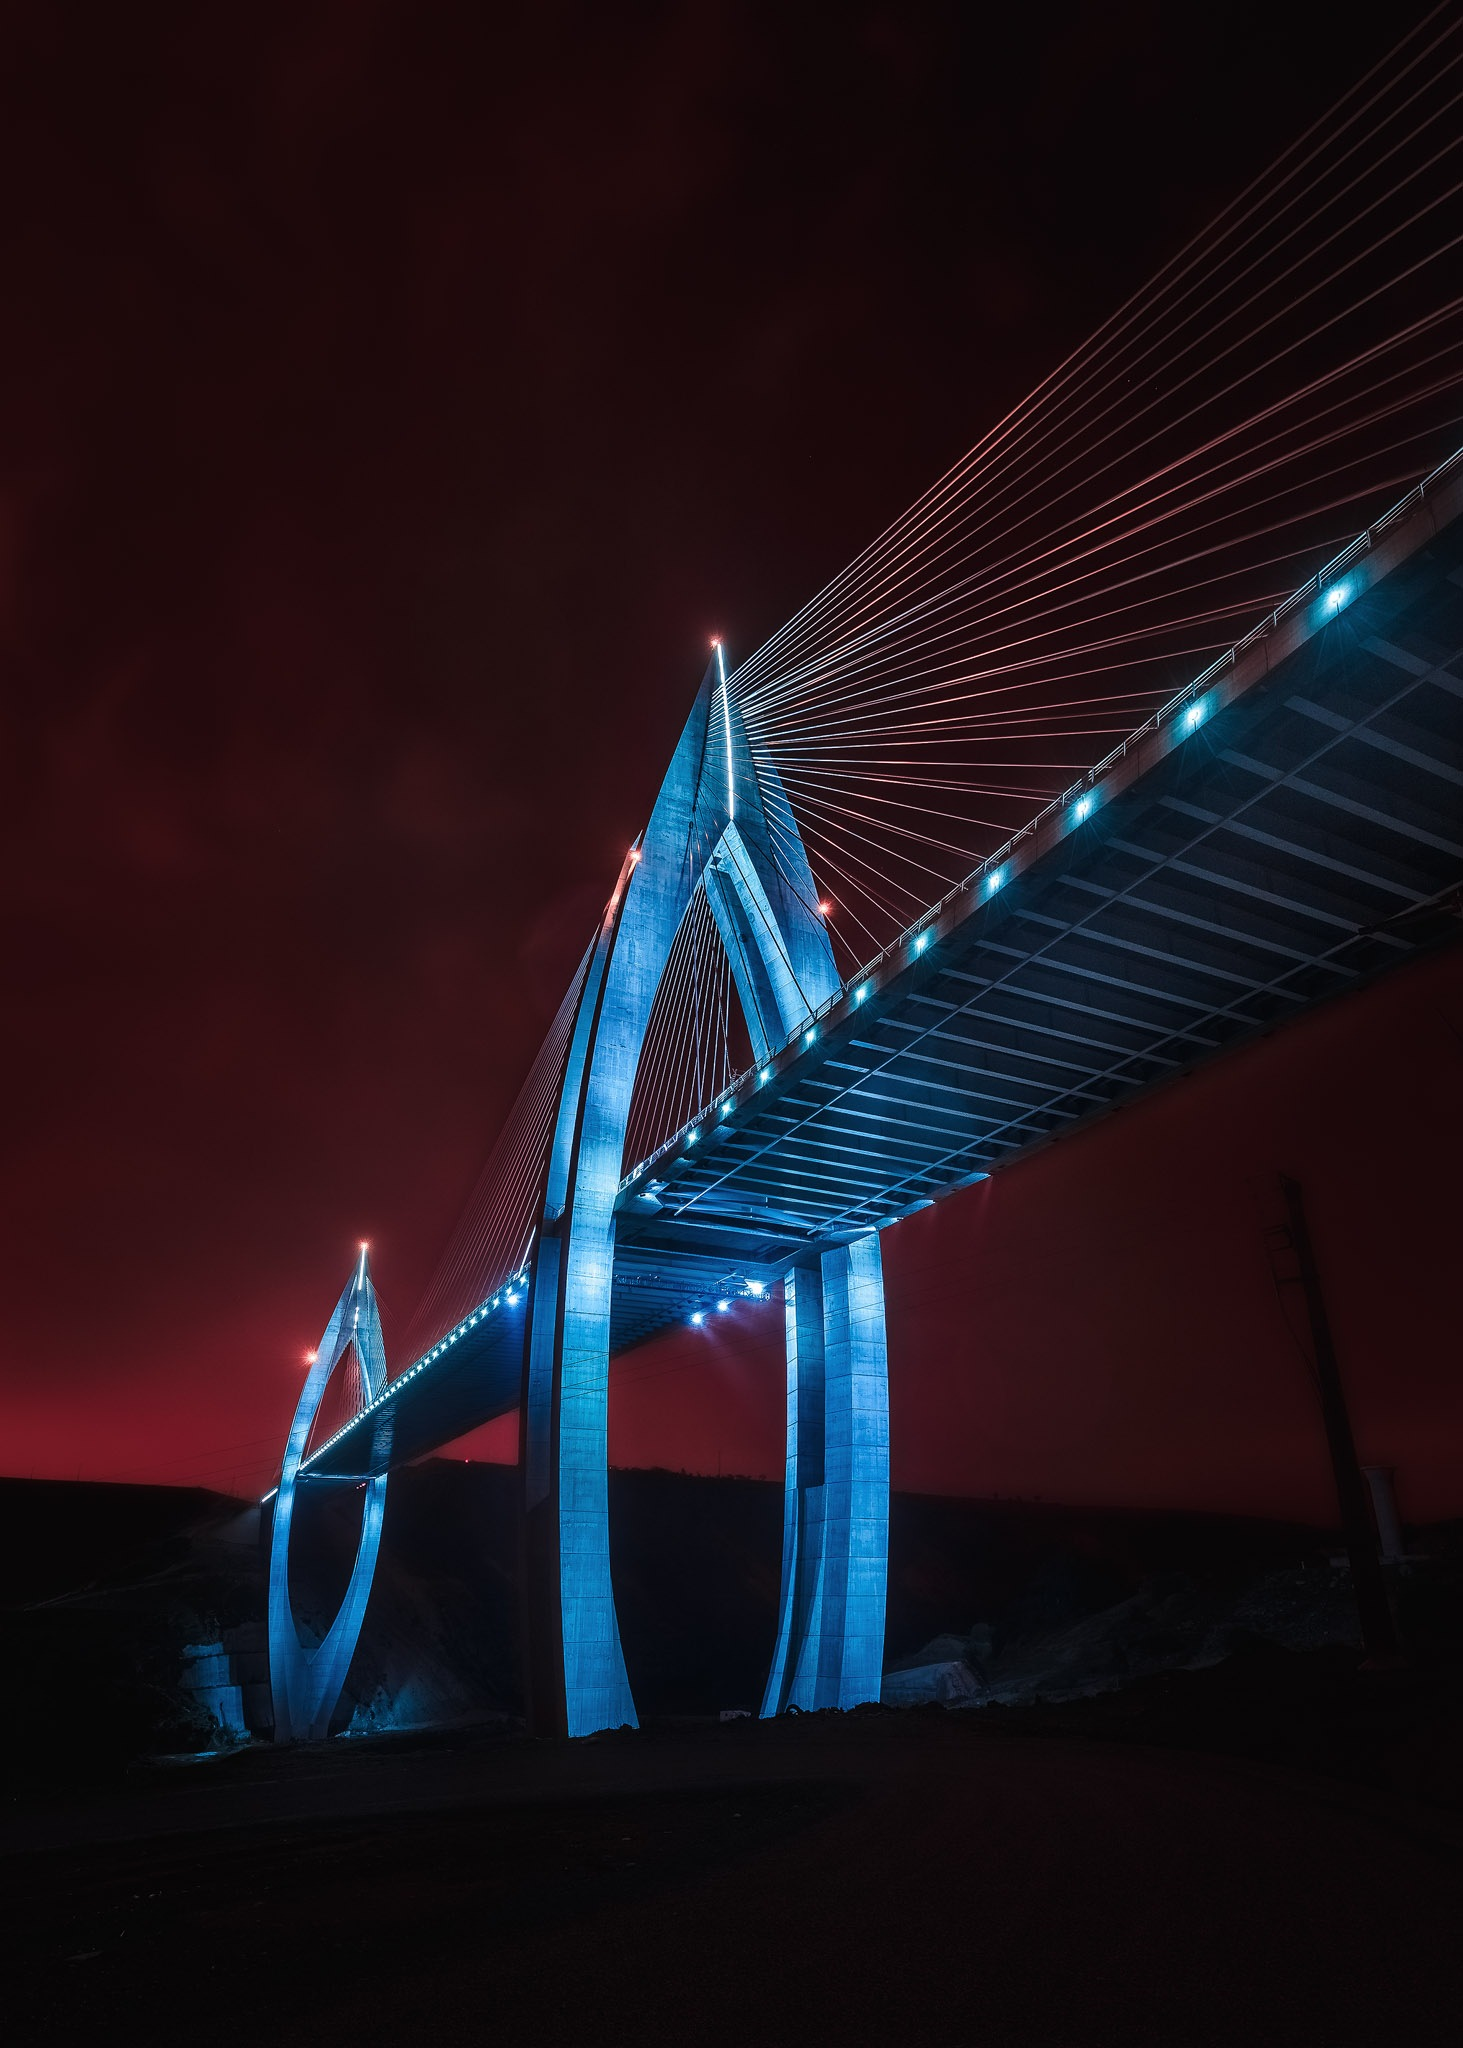 The Tall Bridge by Sadik Boujaida